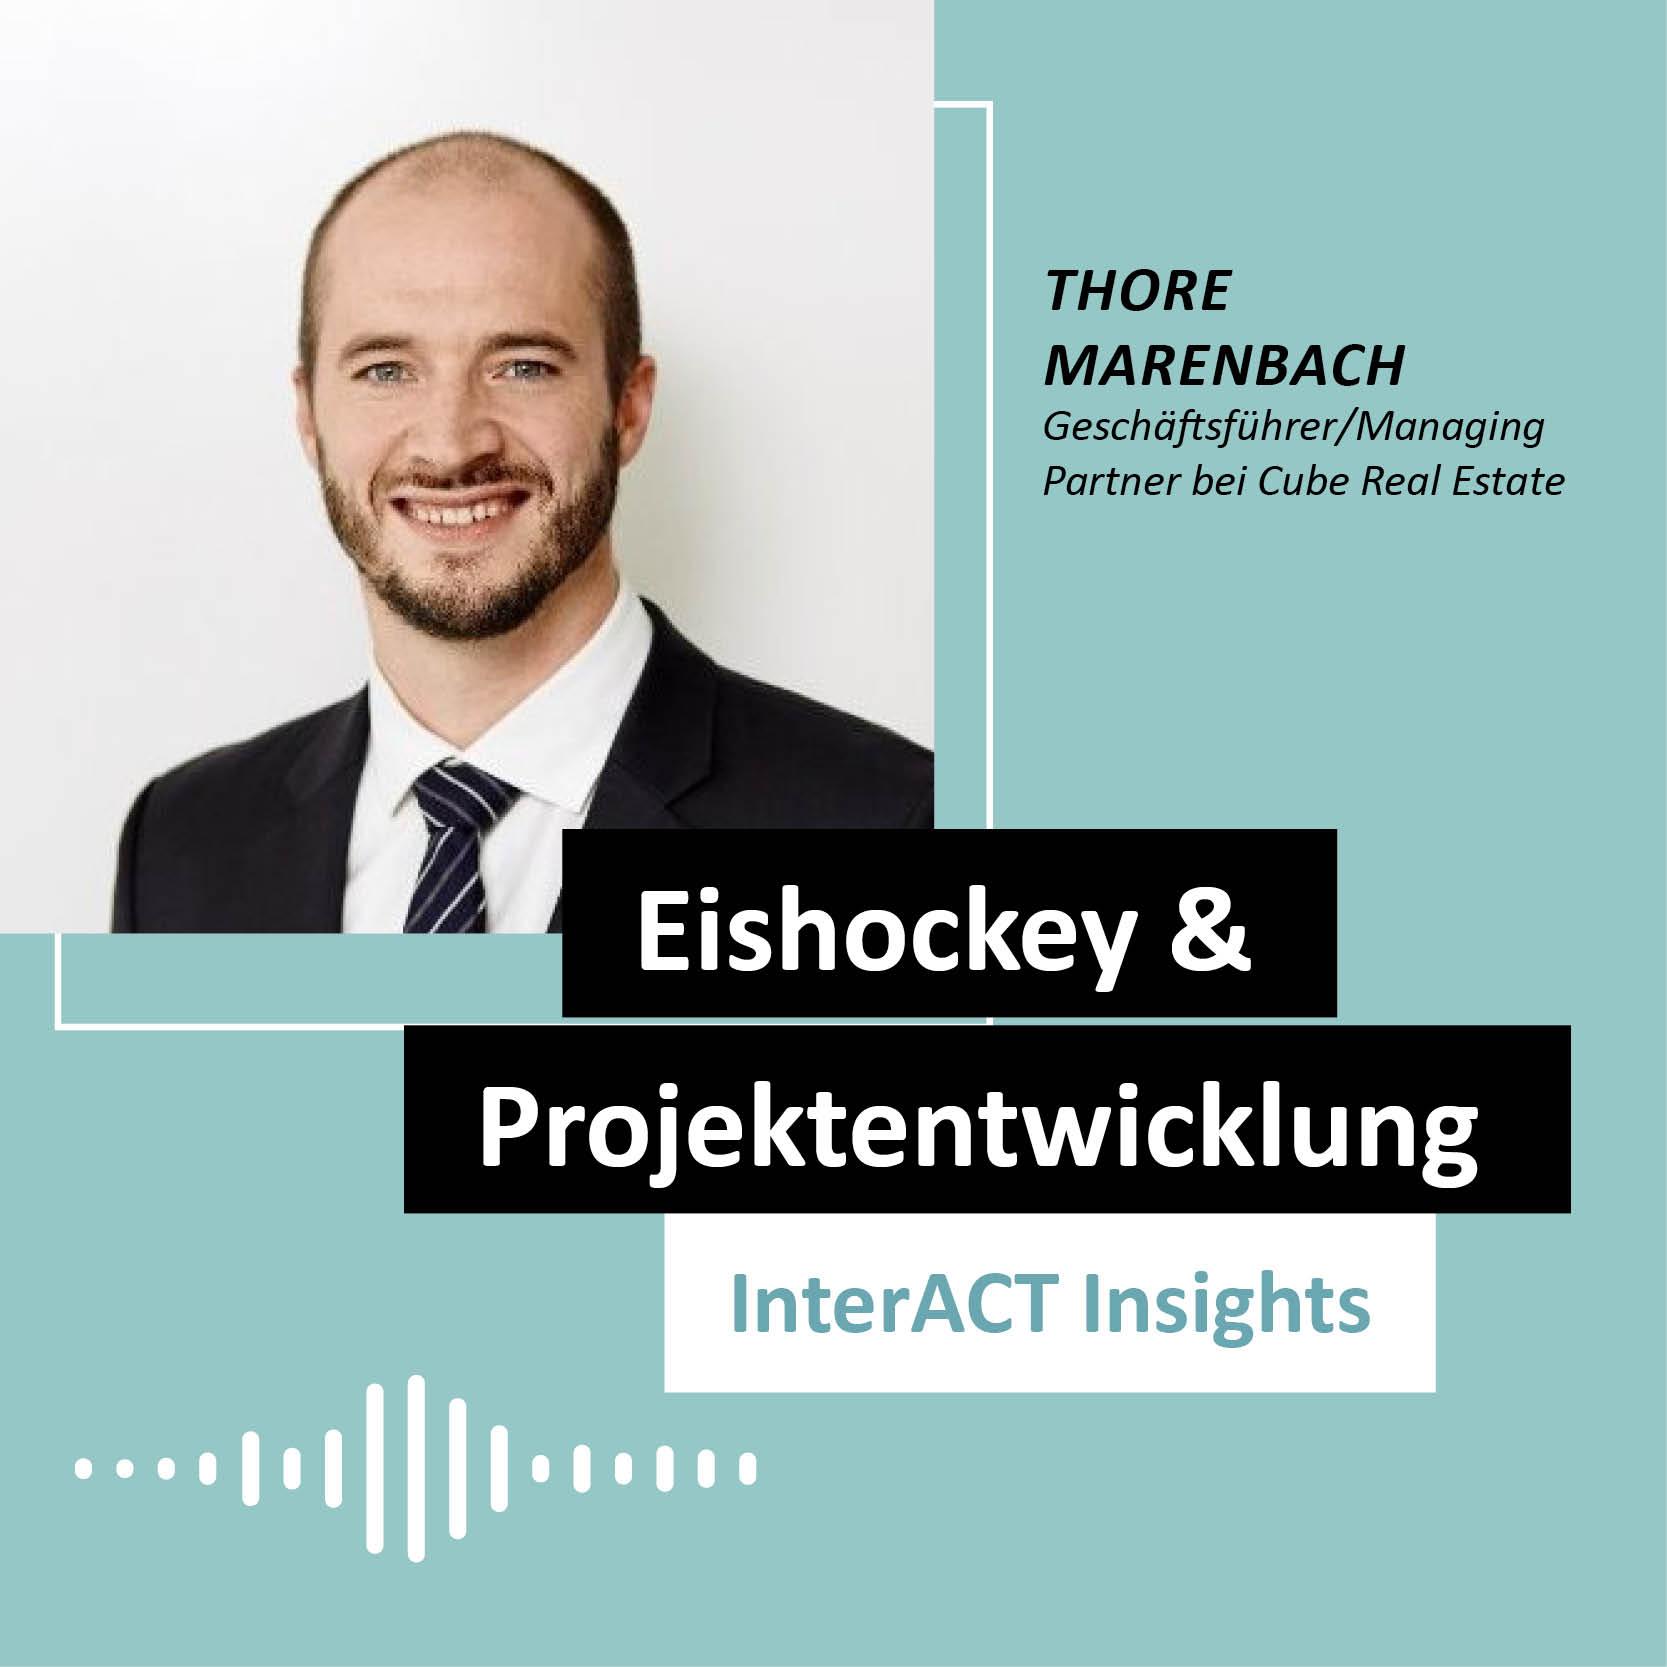 "Podcastfolge mit Thore Marenbach - ""Eishockey & Projekt"" - InterACT Insights"